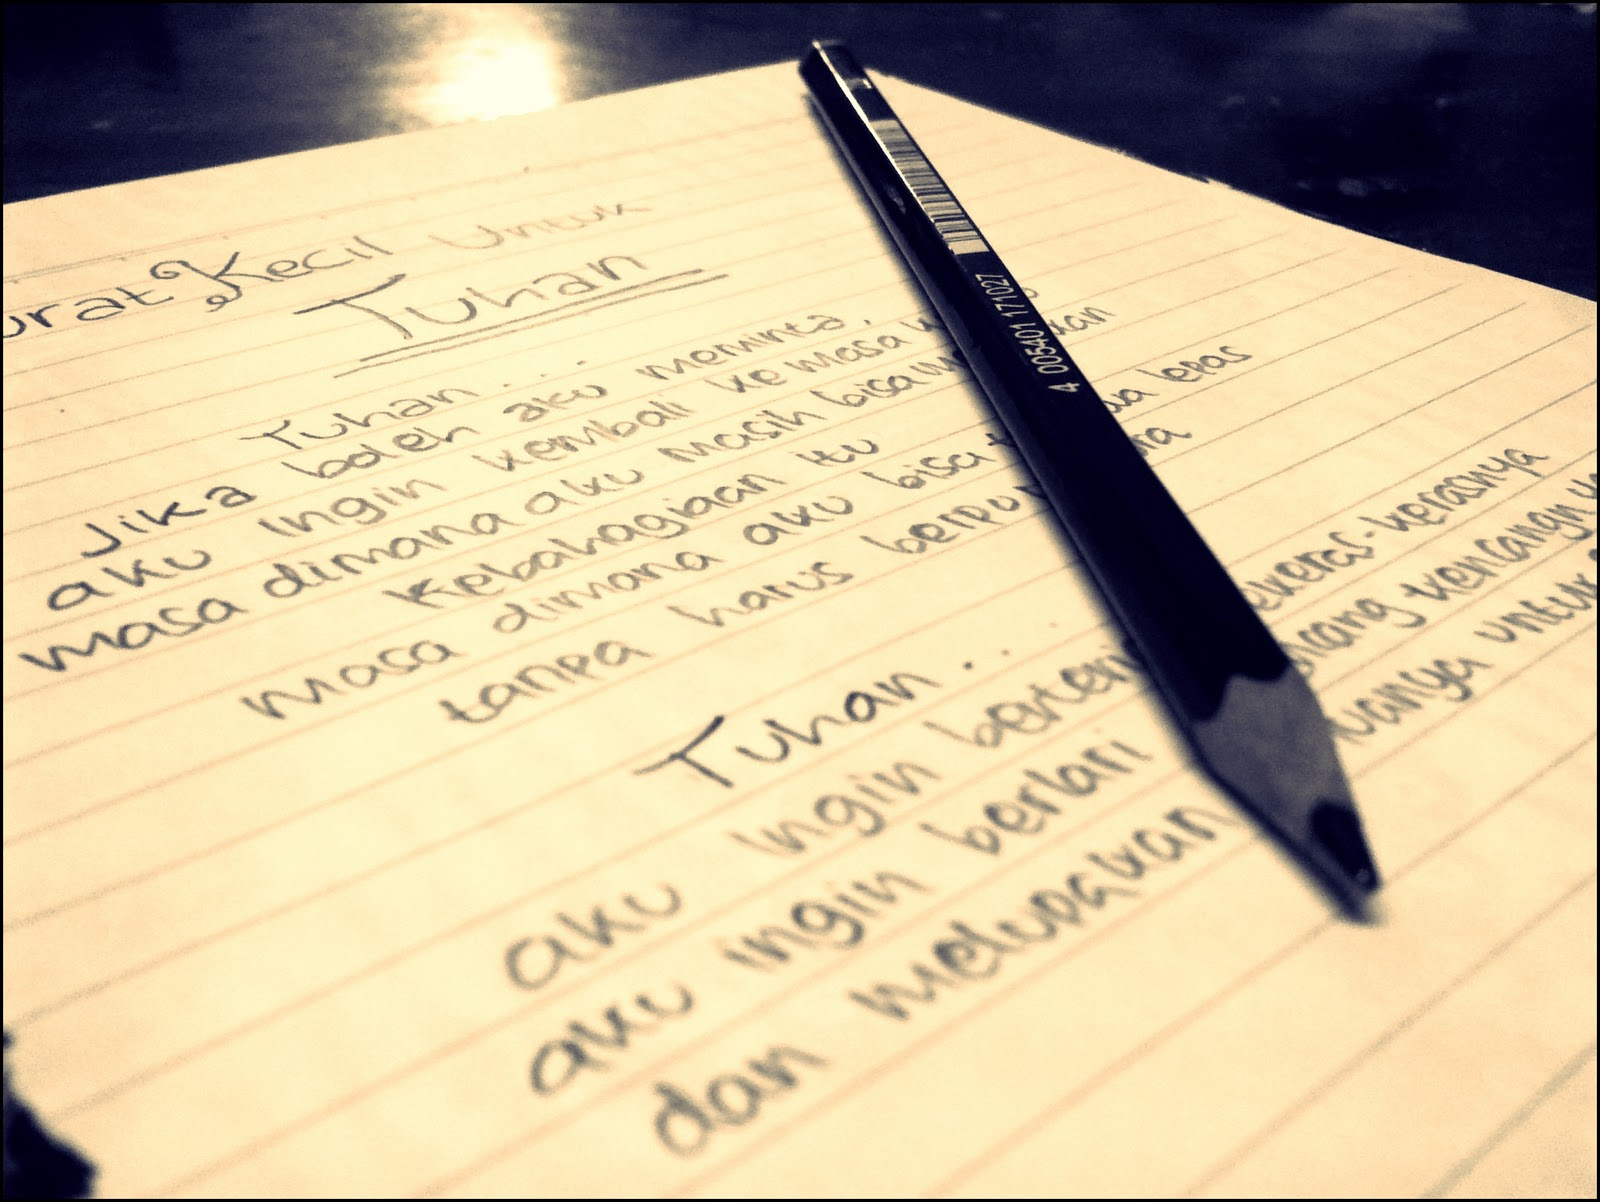 16+ Contoh surat cinta kepada tuhan yesus terbaru yang baik dan benar